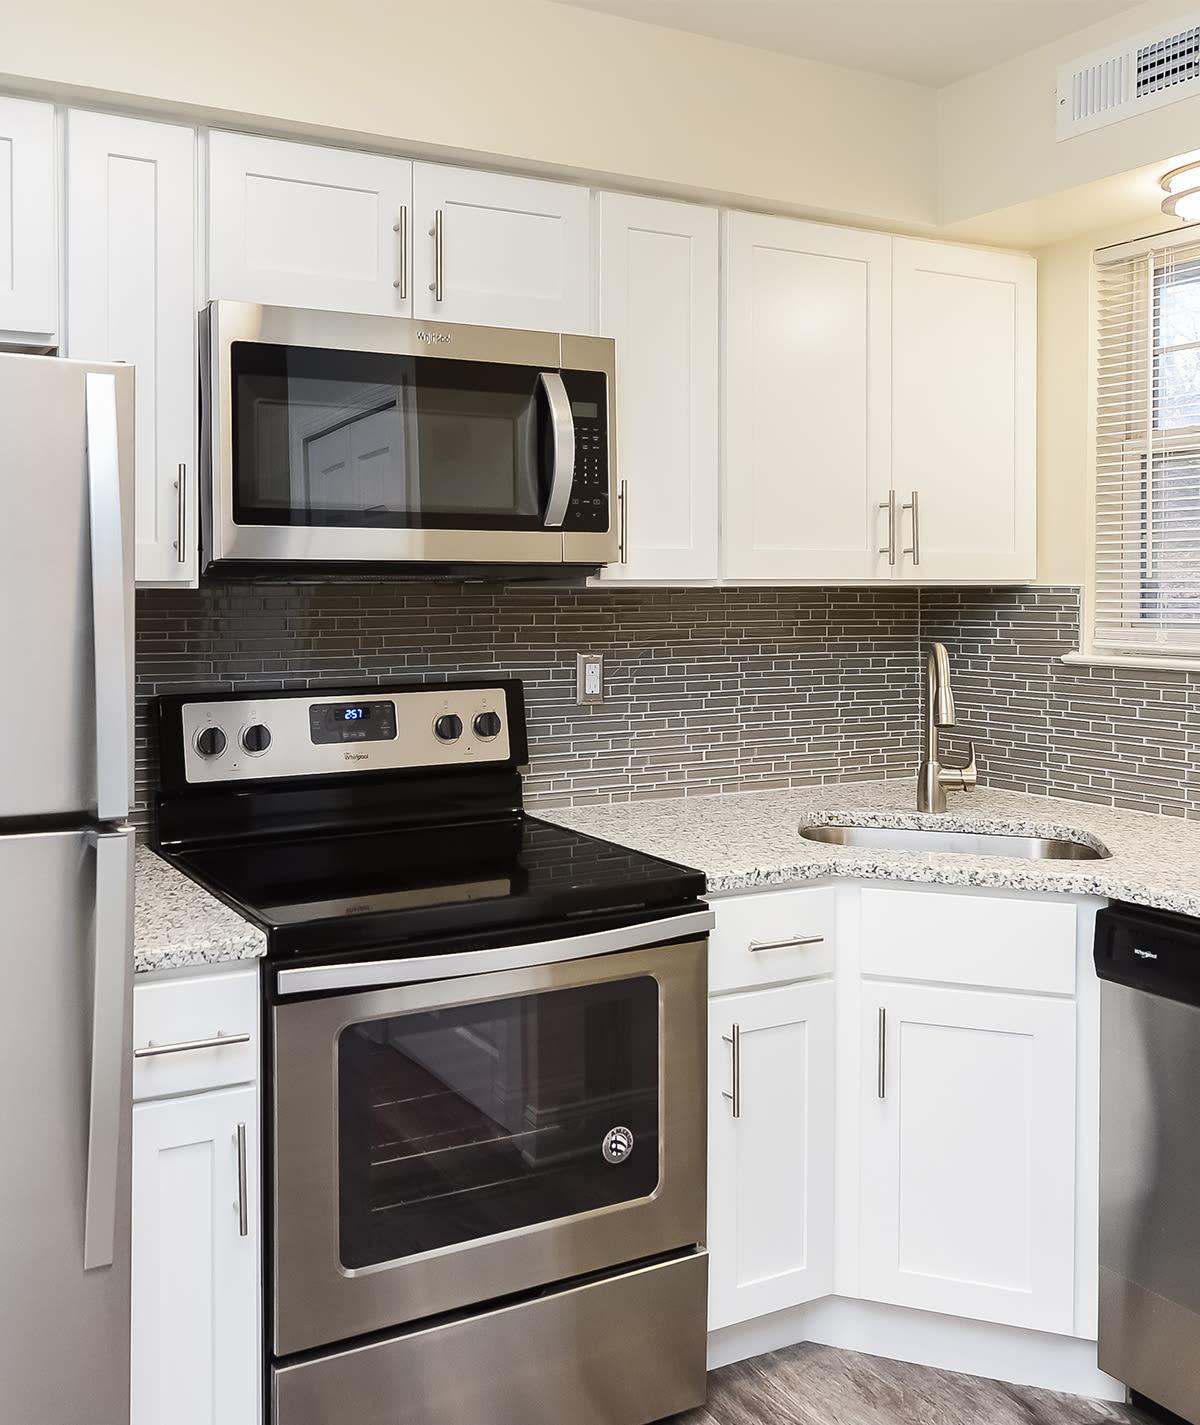 Apartments in Blackwood, NJ